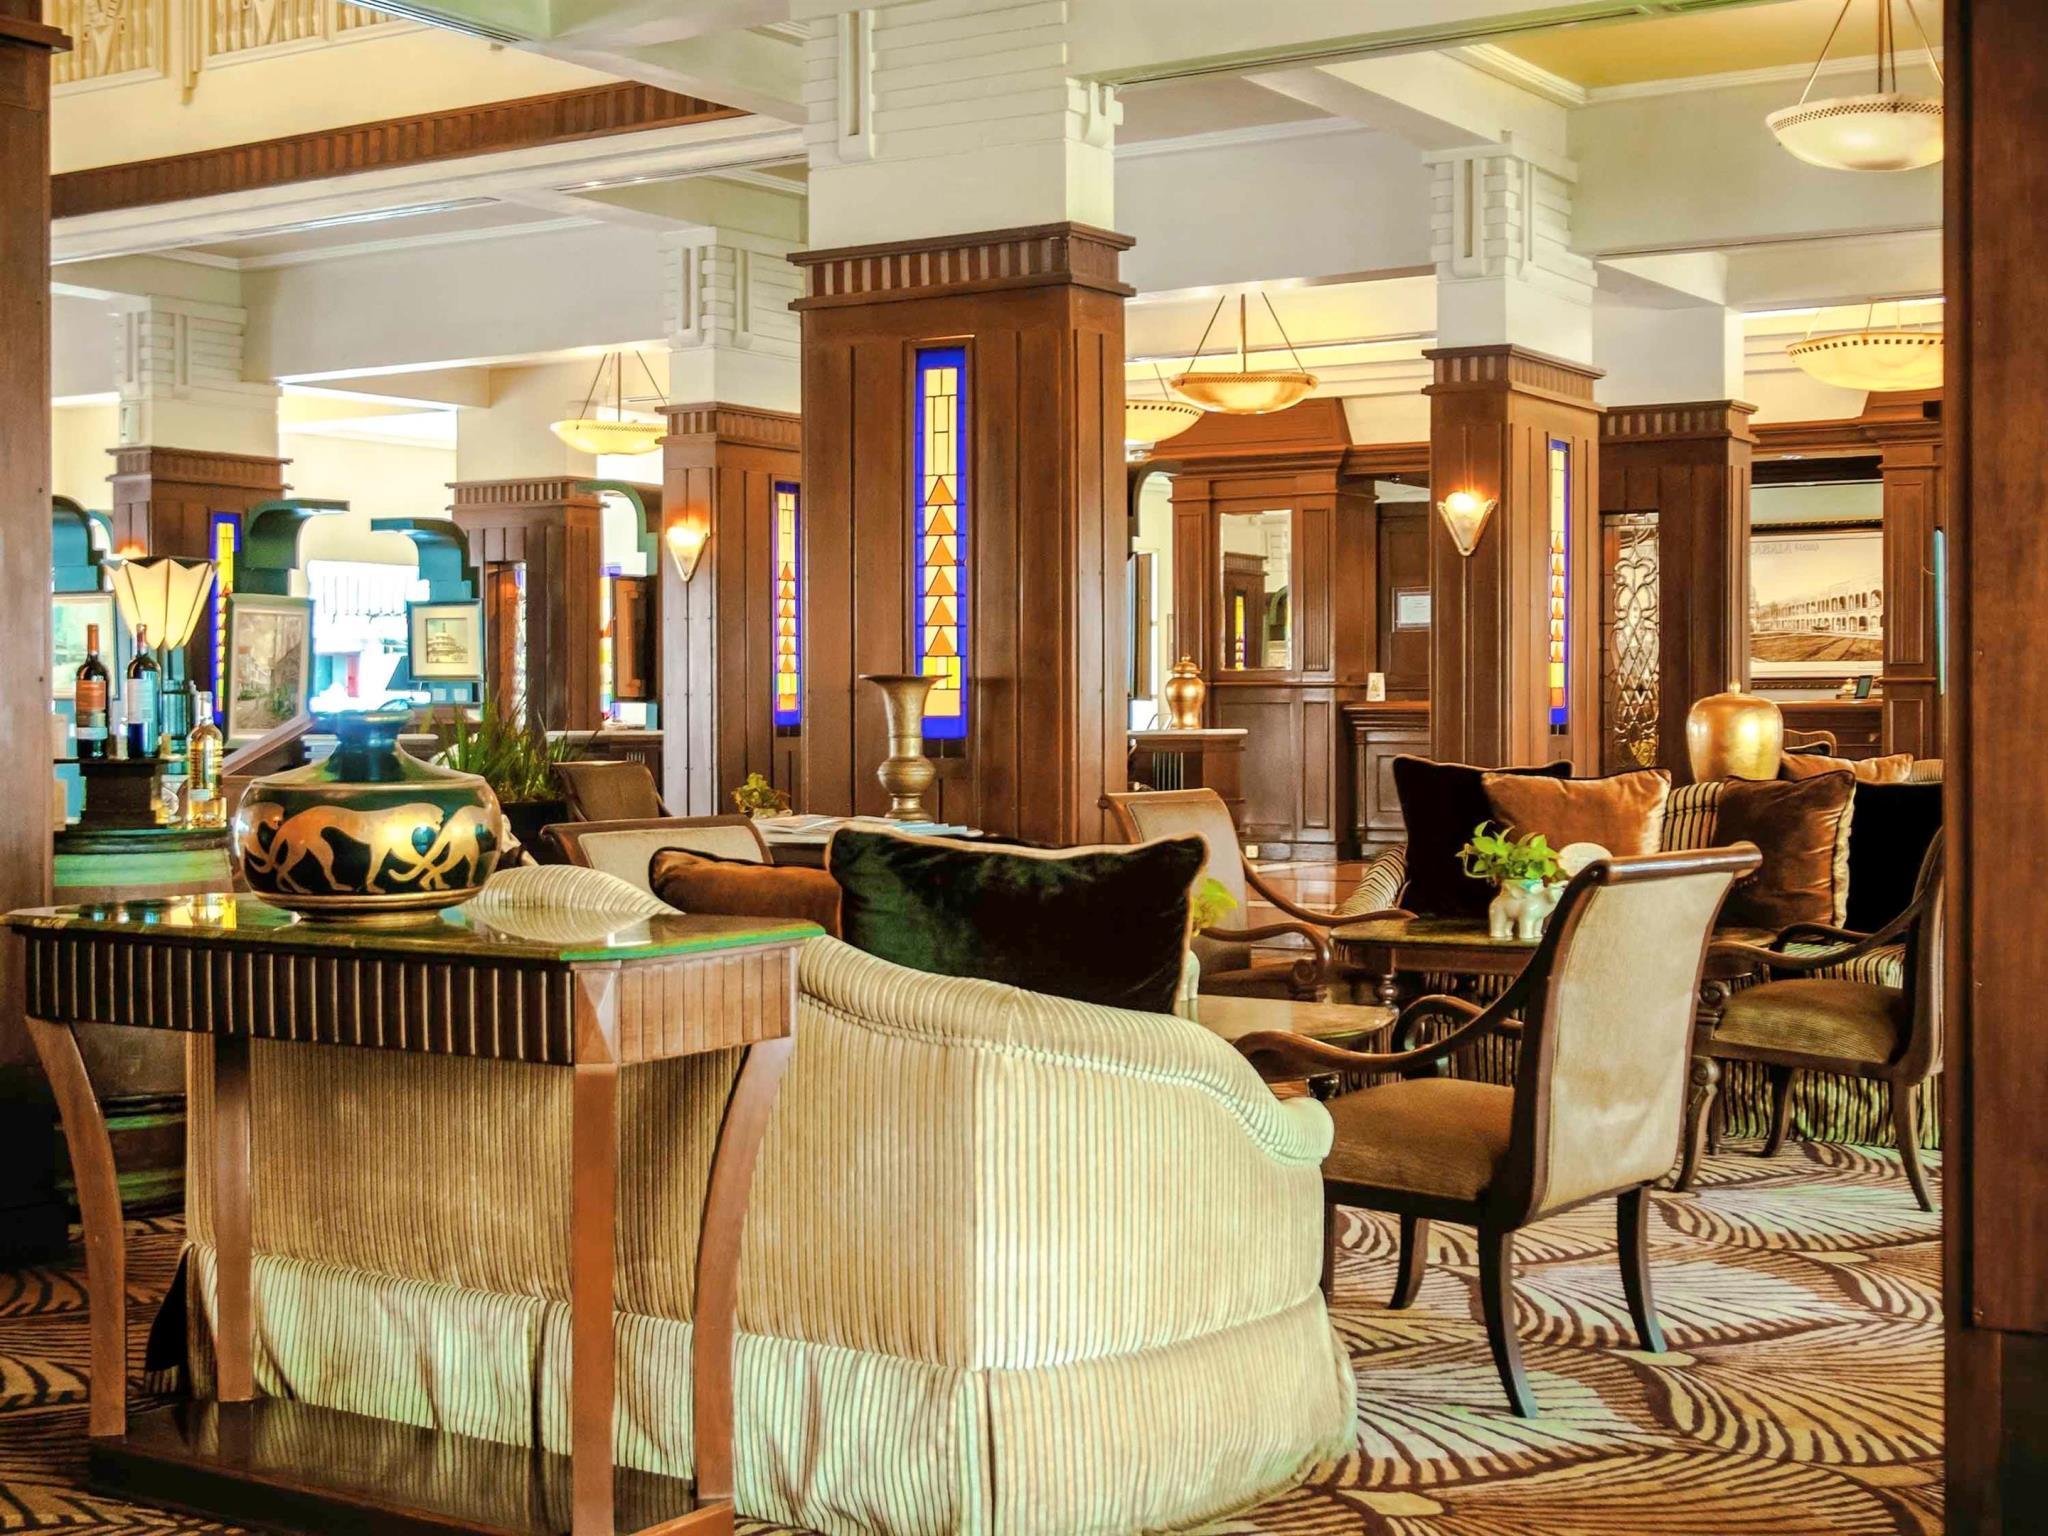 Hotel Hotel Majapahit Surabaya - Jalan Tunjungan 65 - Surabaya